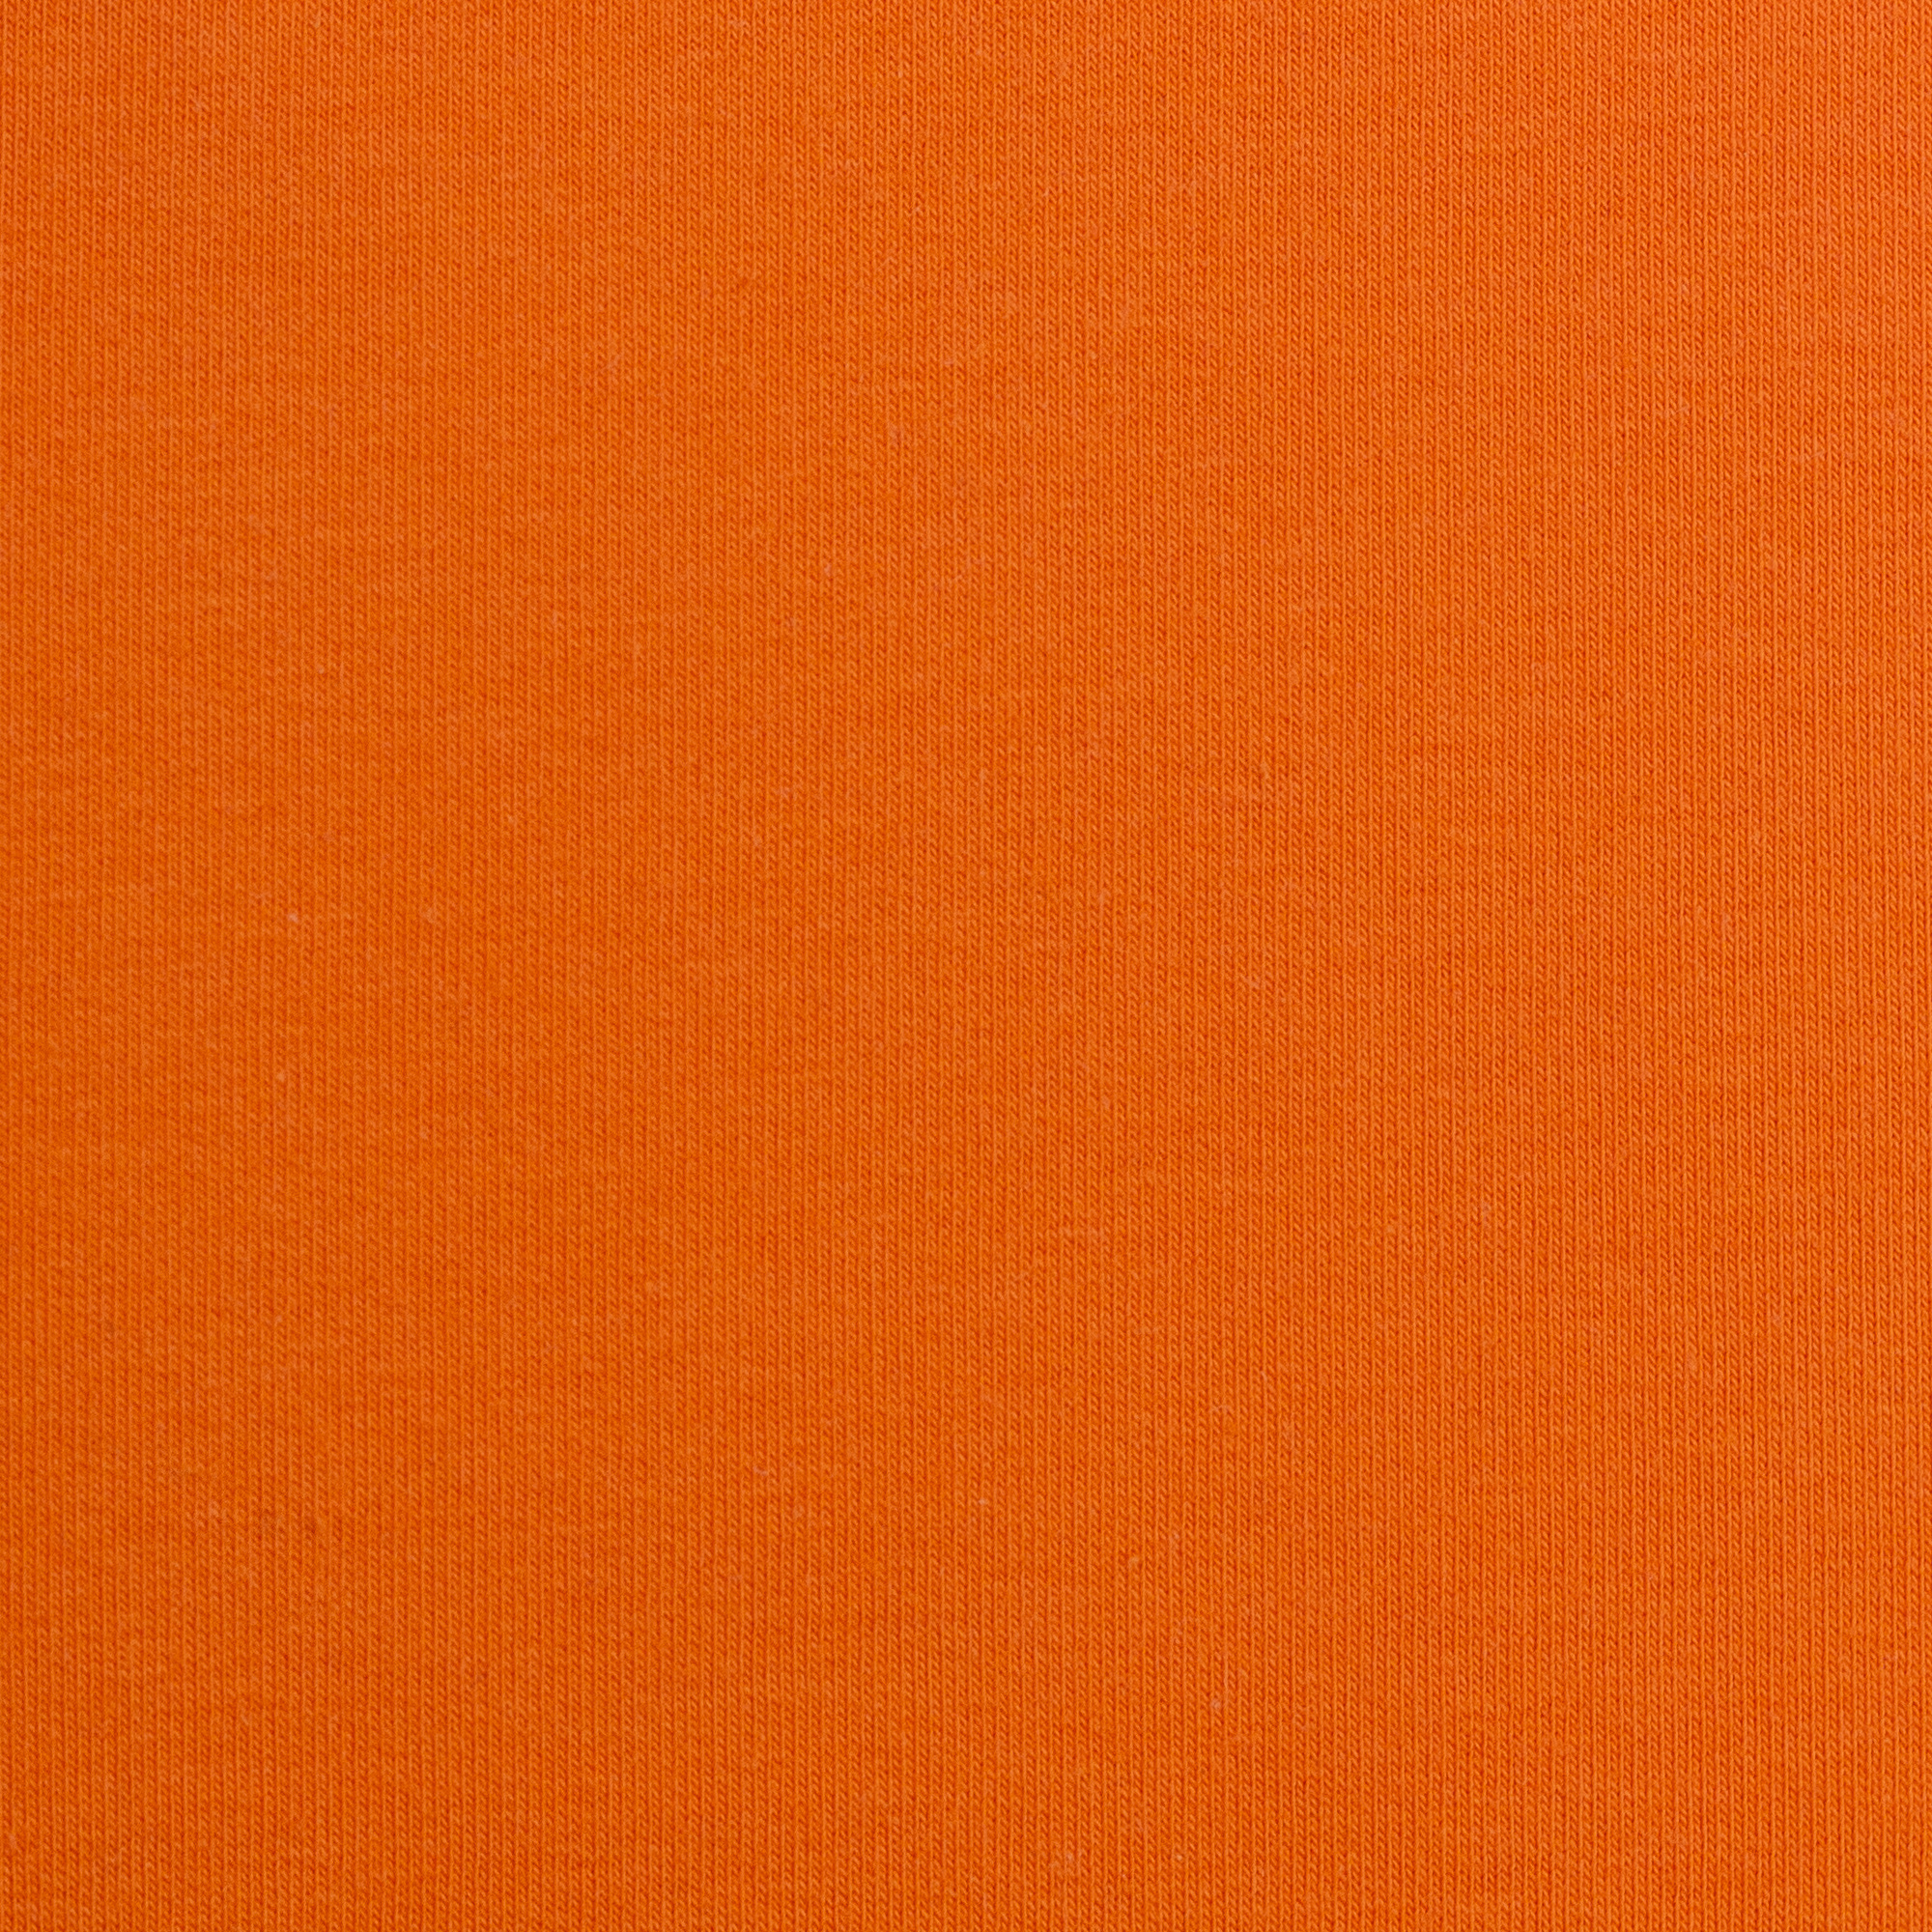 French Terry - Oranje-2